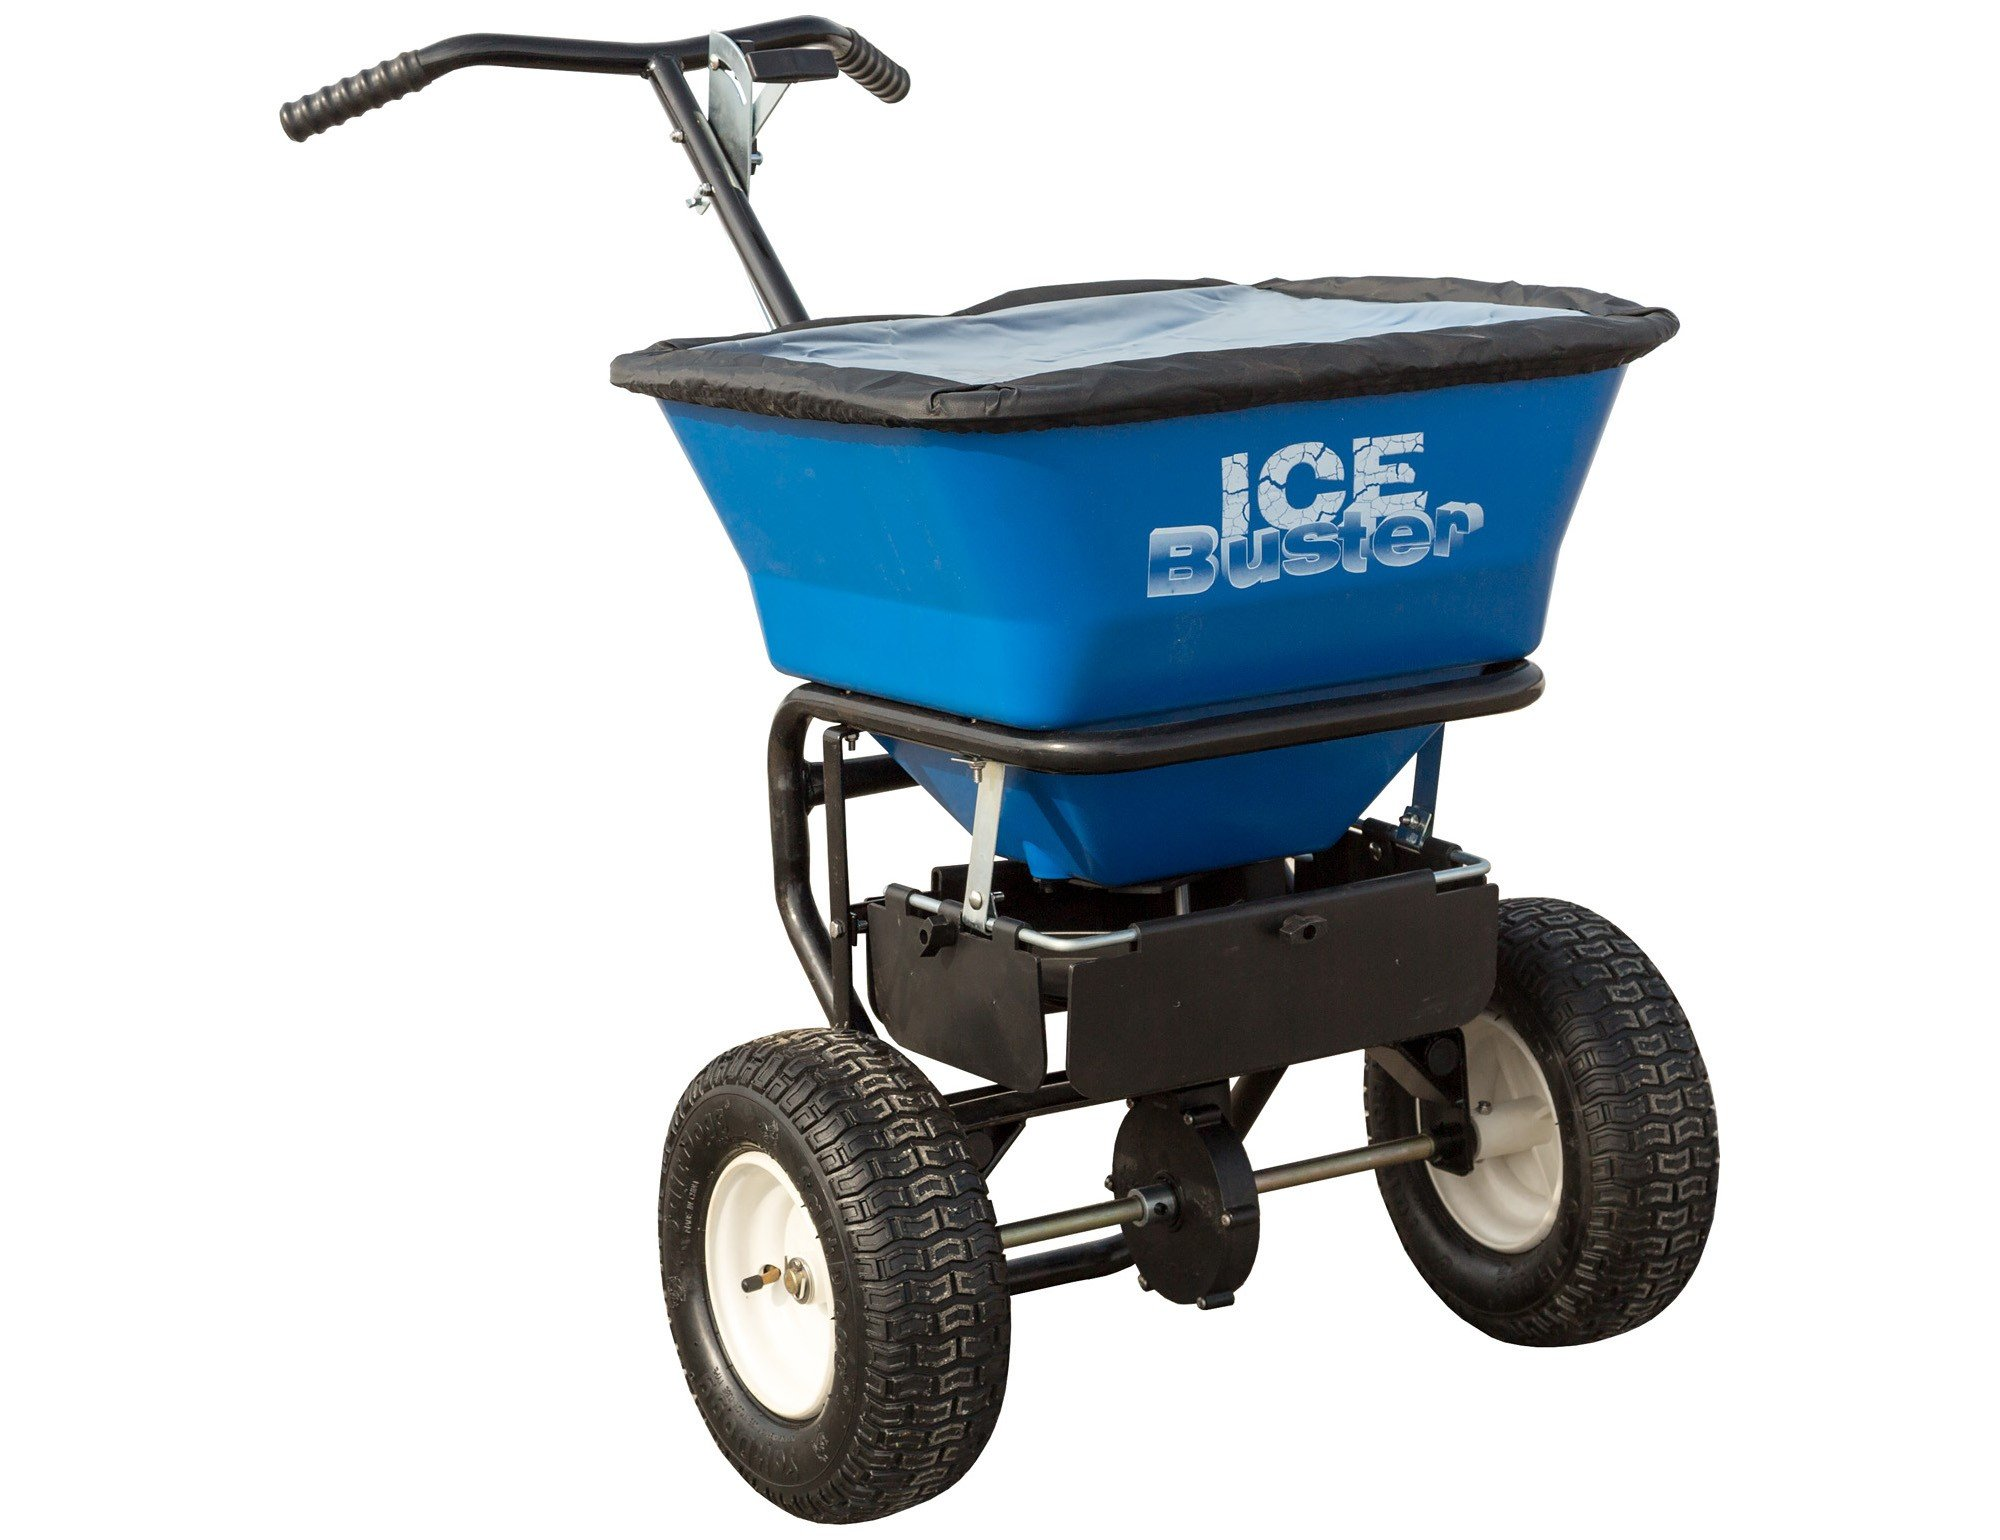 Buyers Products IB101G Professional 100 lb Capacity Walk Behind Broadcast Salt Spreader, Blue